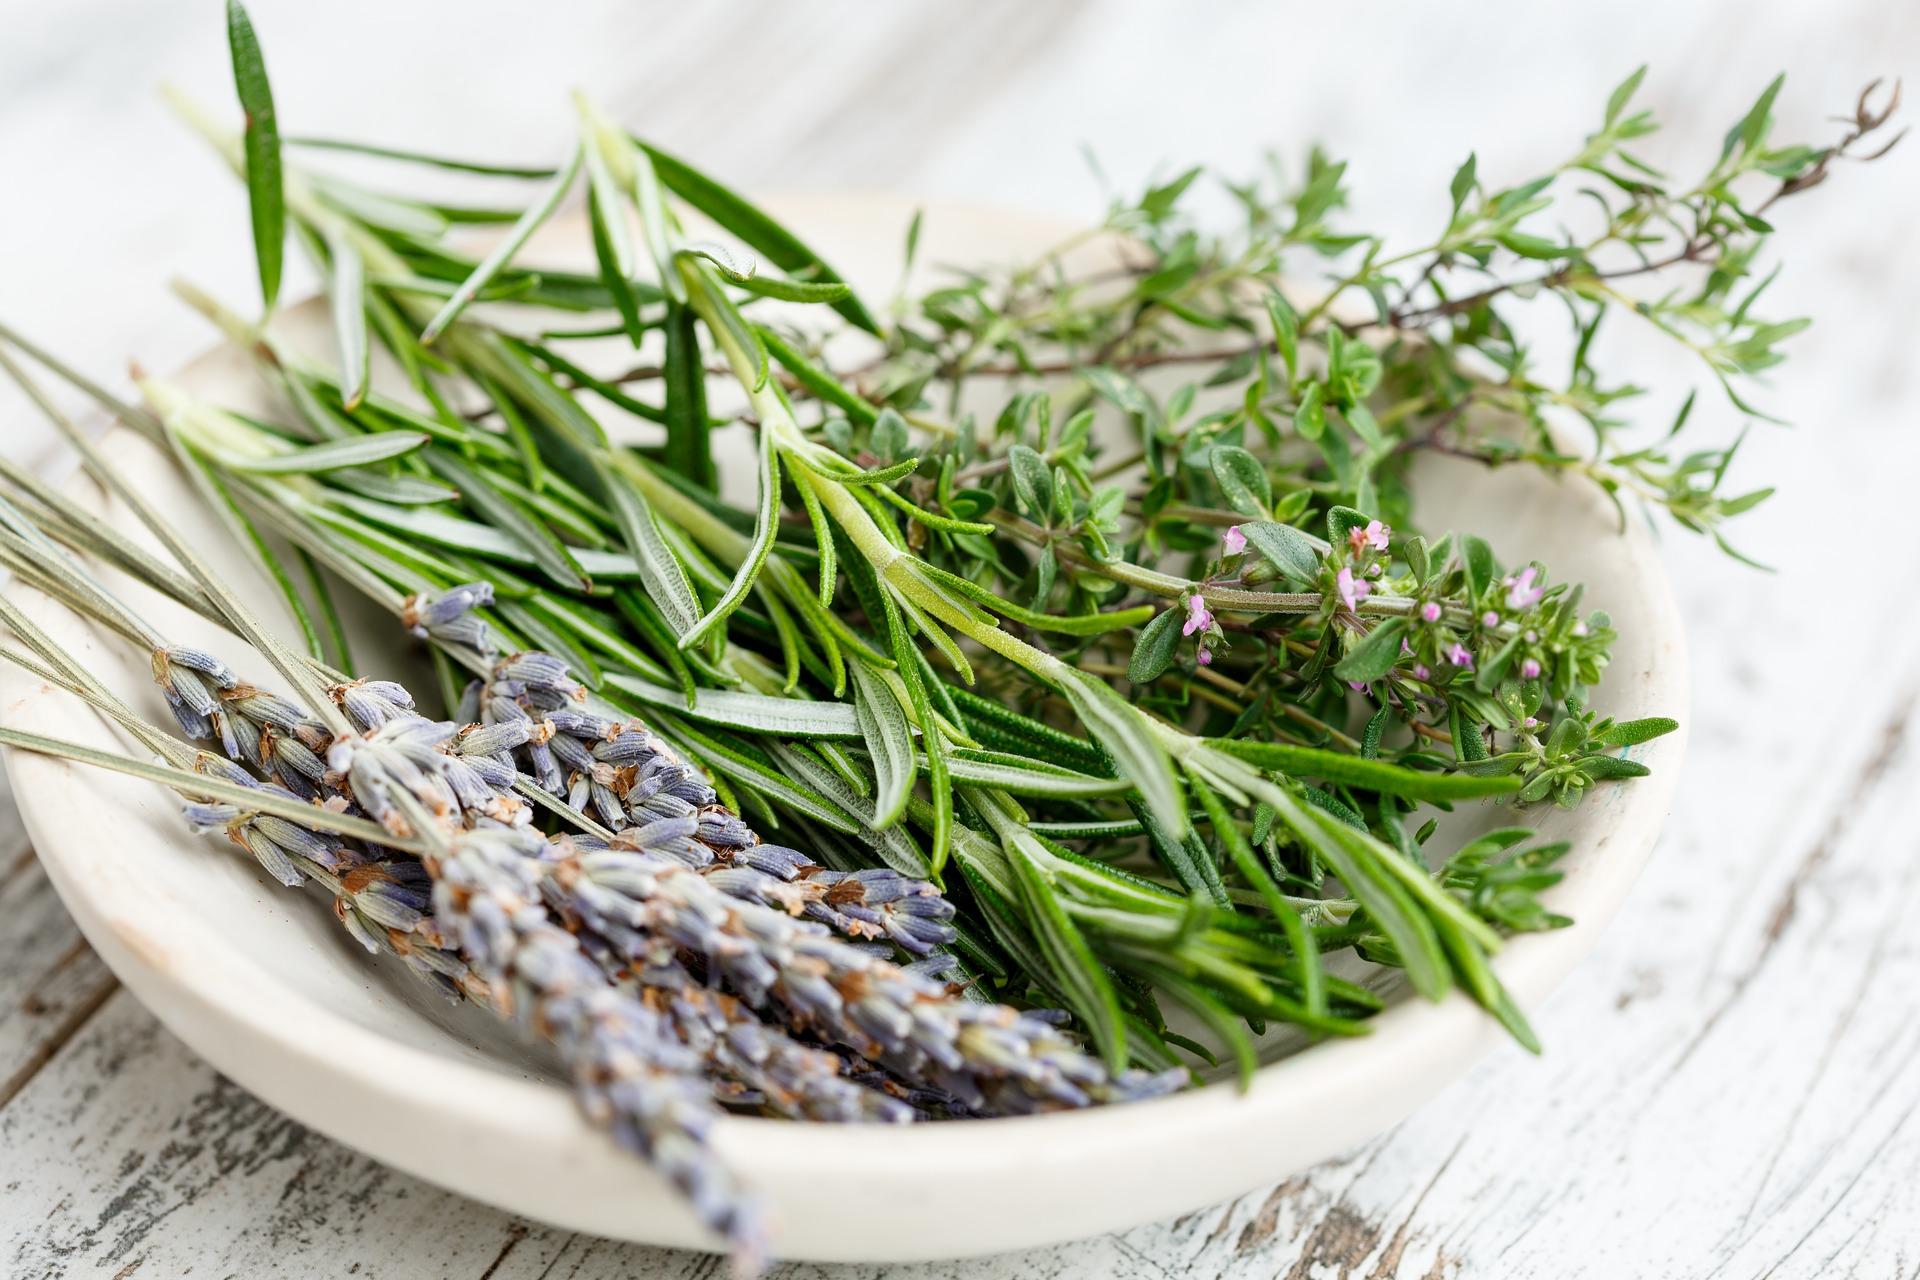 Herbs - The Mediterranean Lifestyle